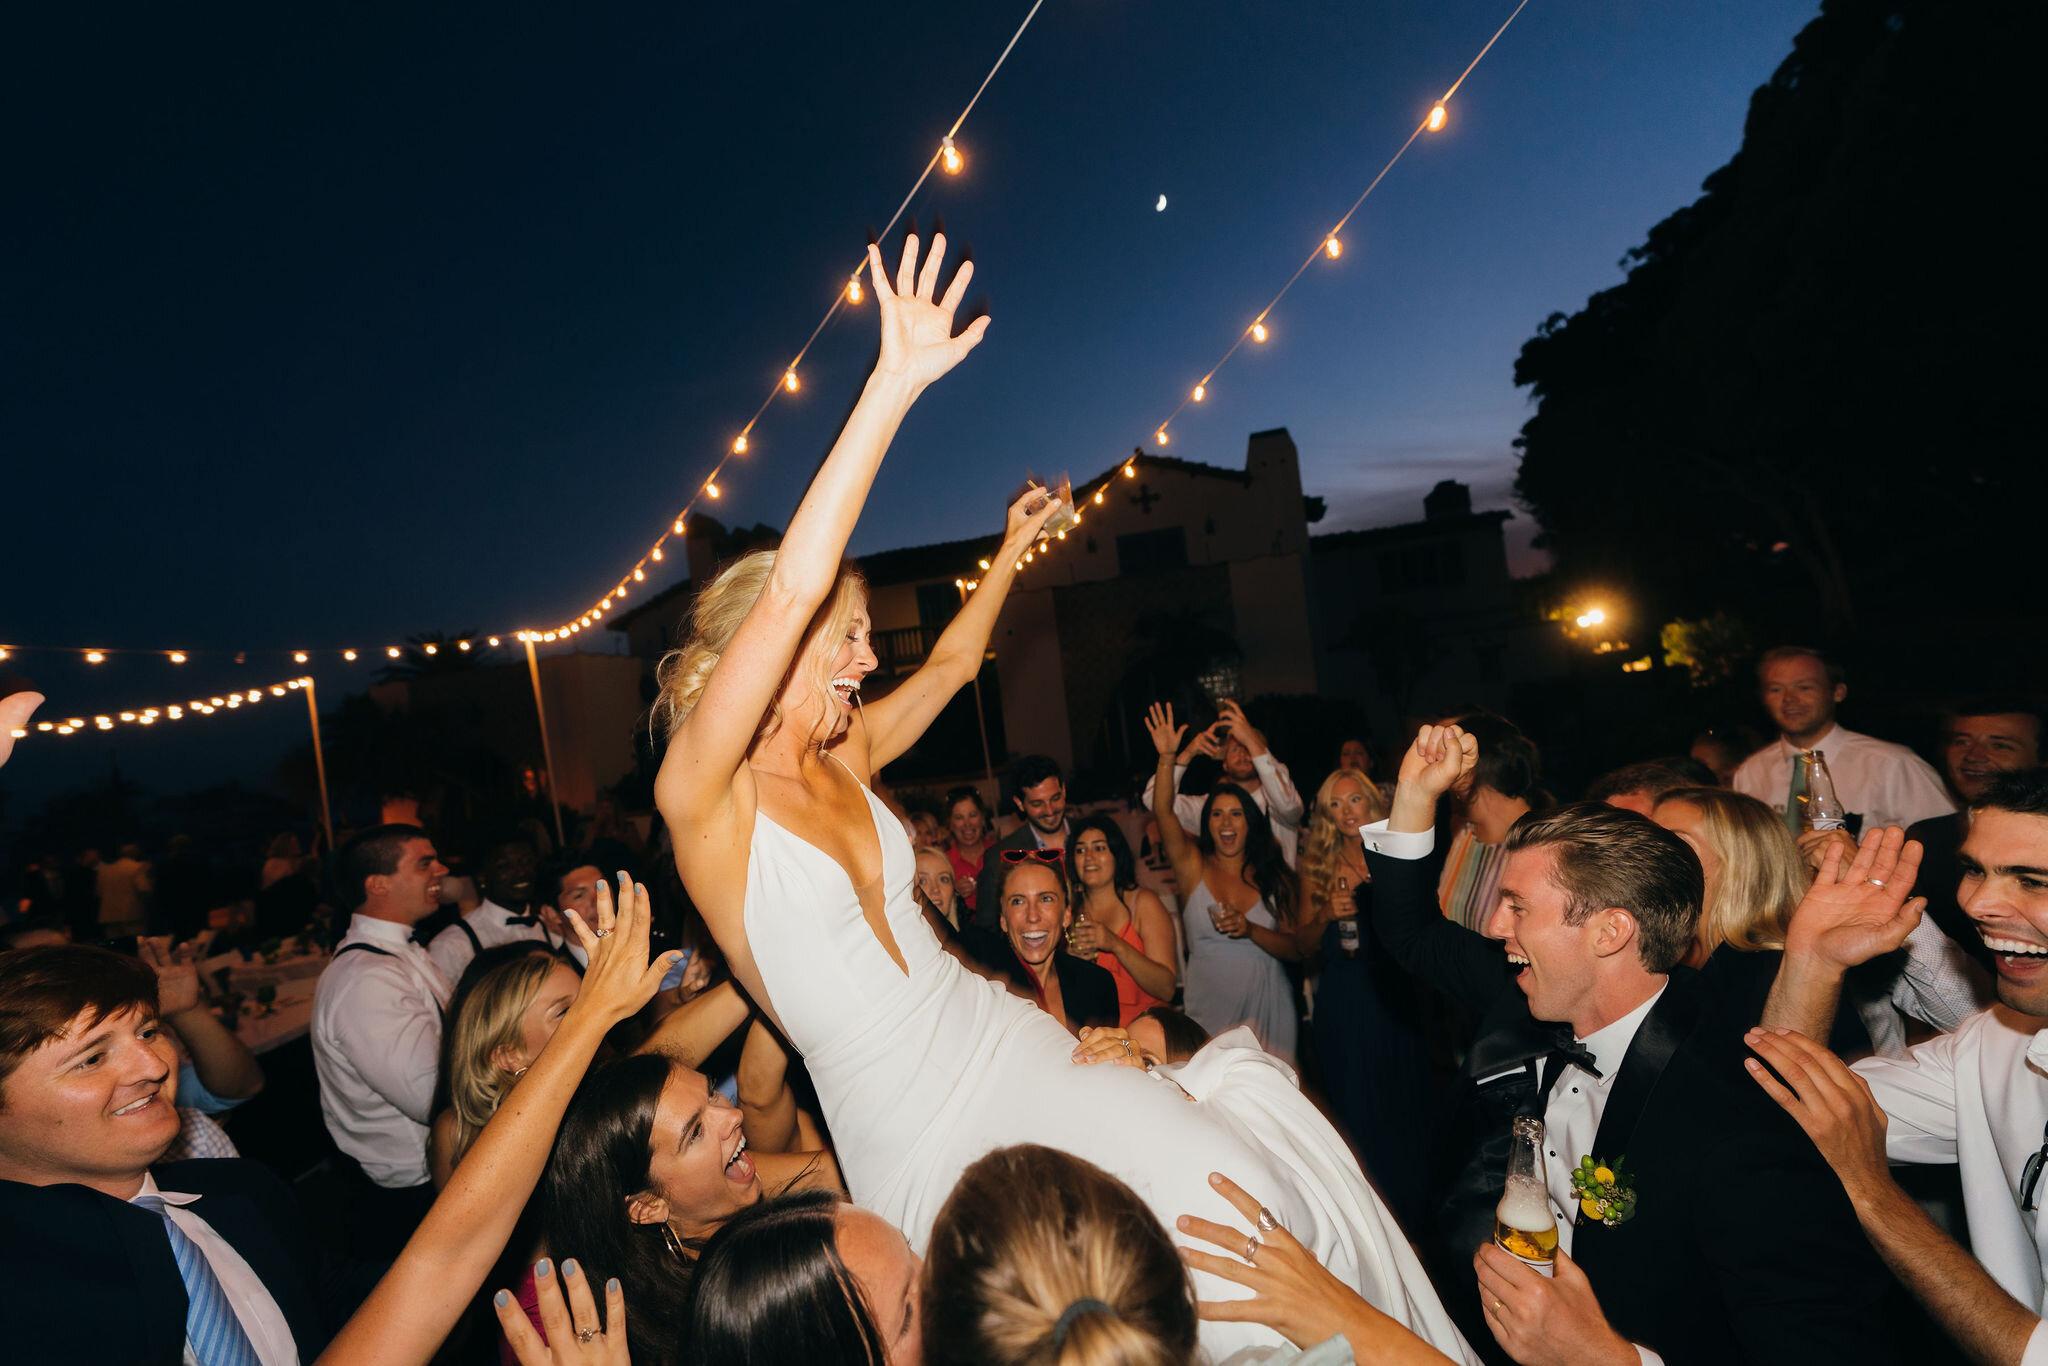 adamson-house-wedding-photography-181.jpg